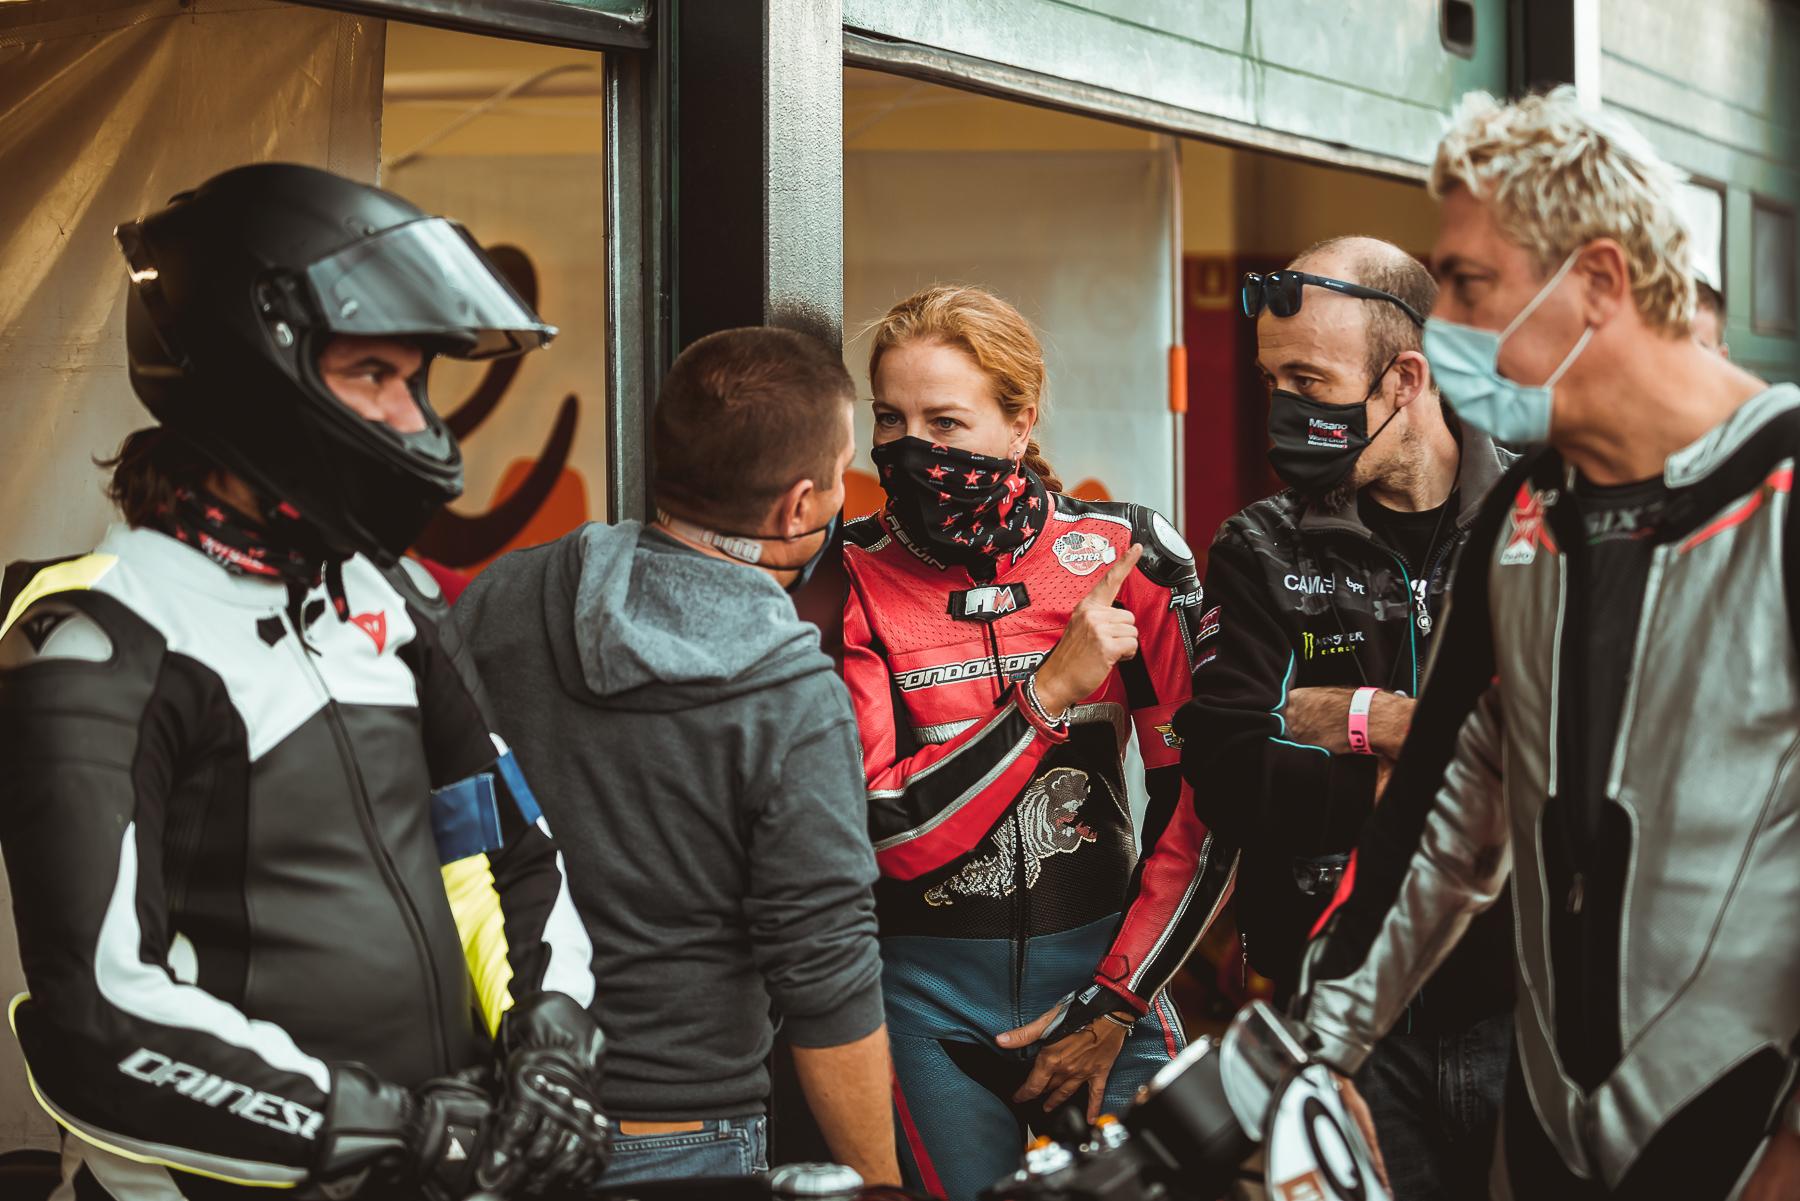 2020-Moto-Guzzi-Endurance-DAY-2-PM-51